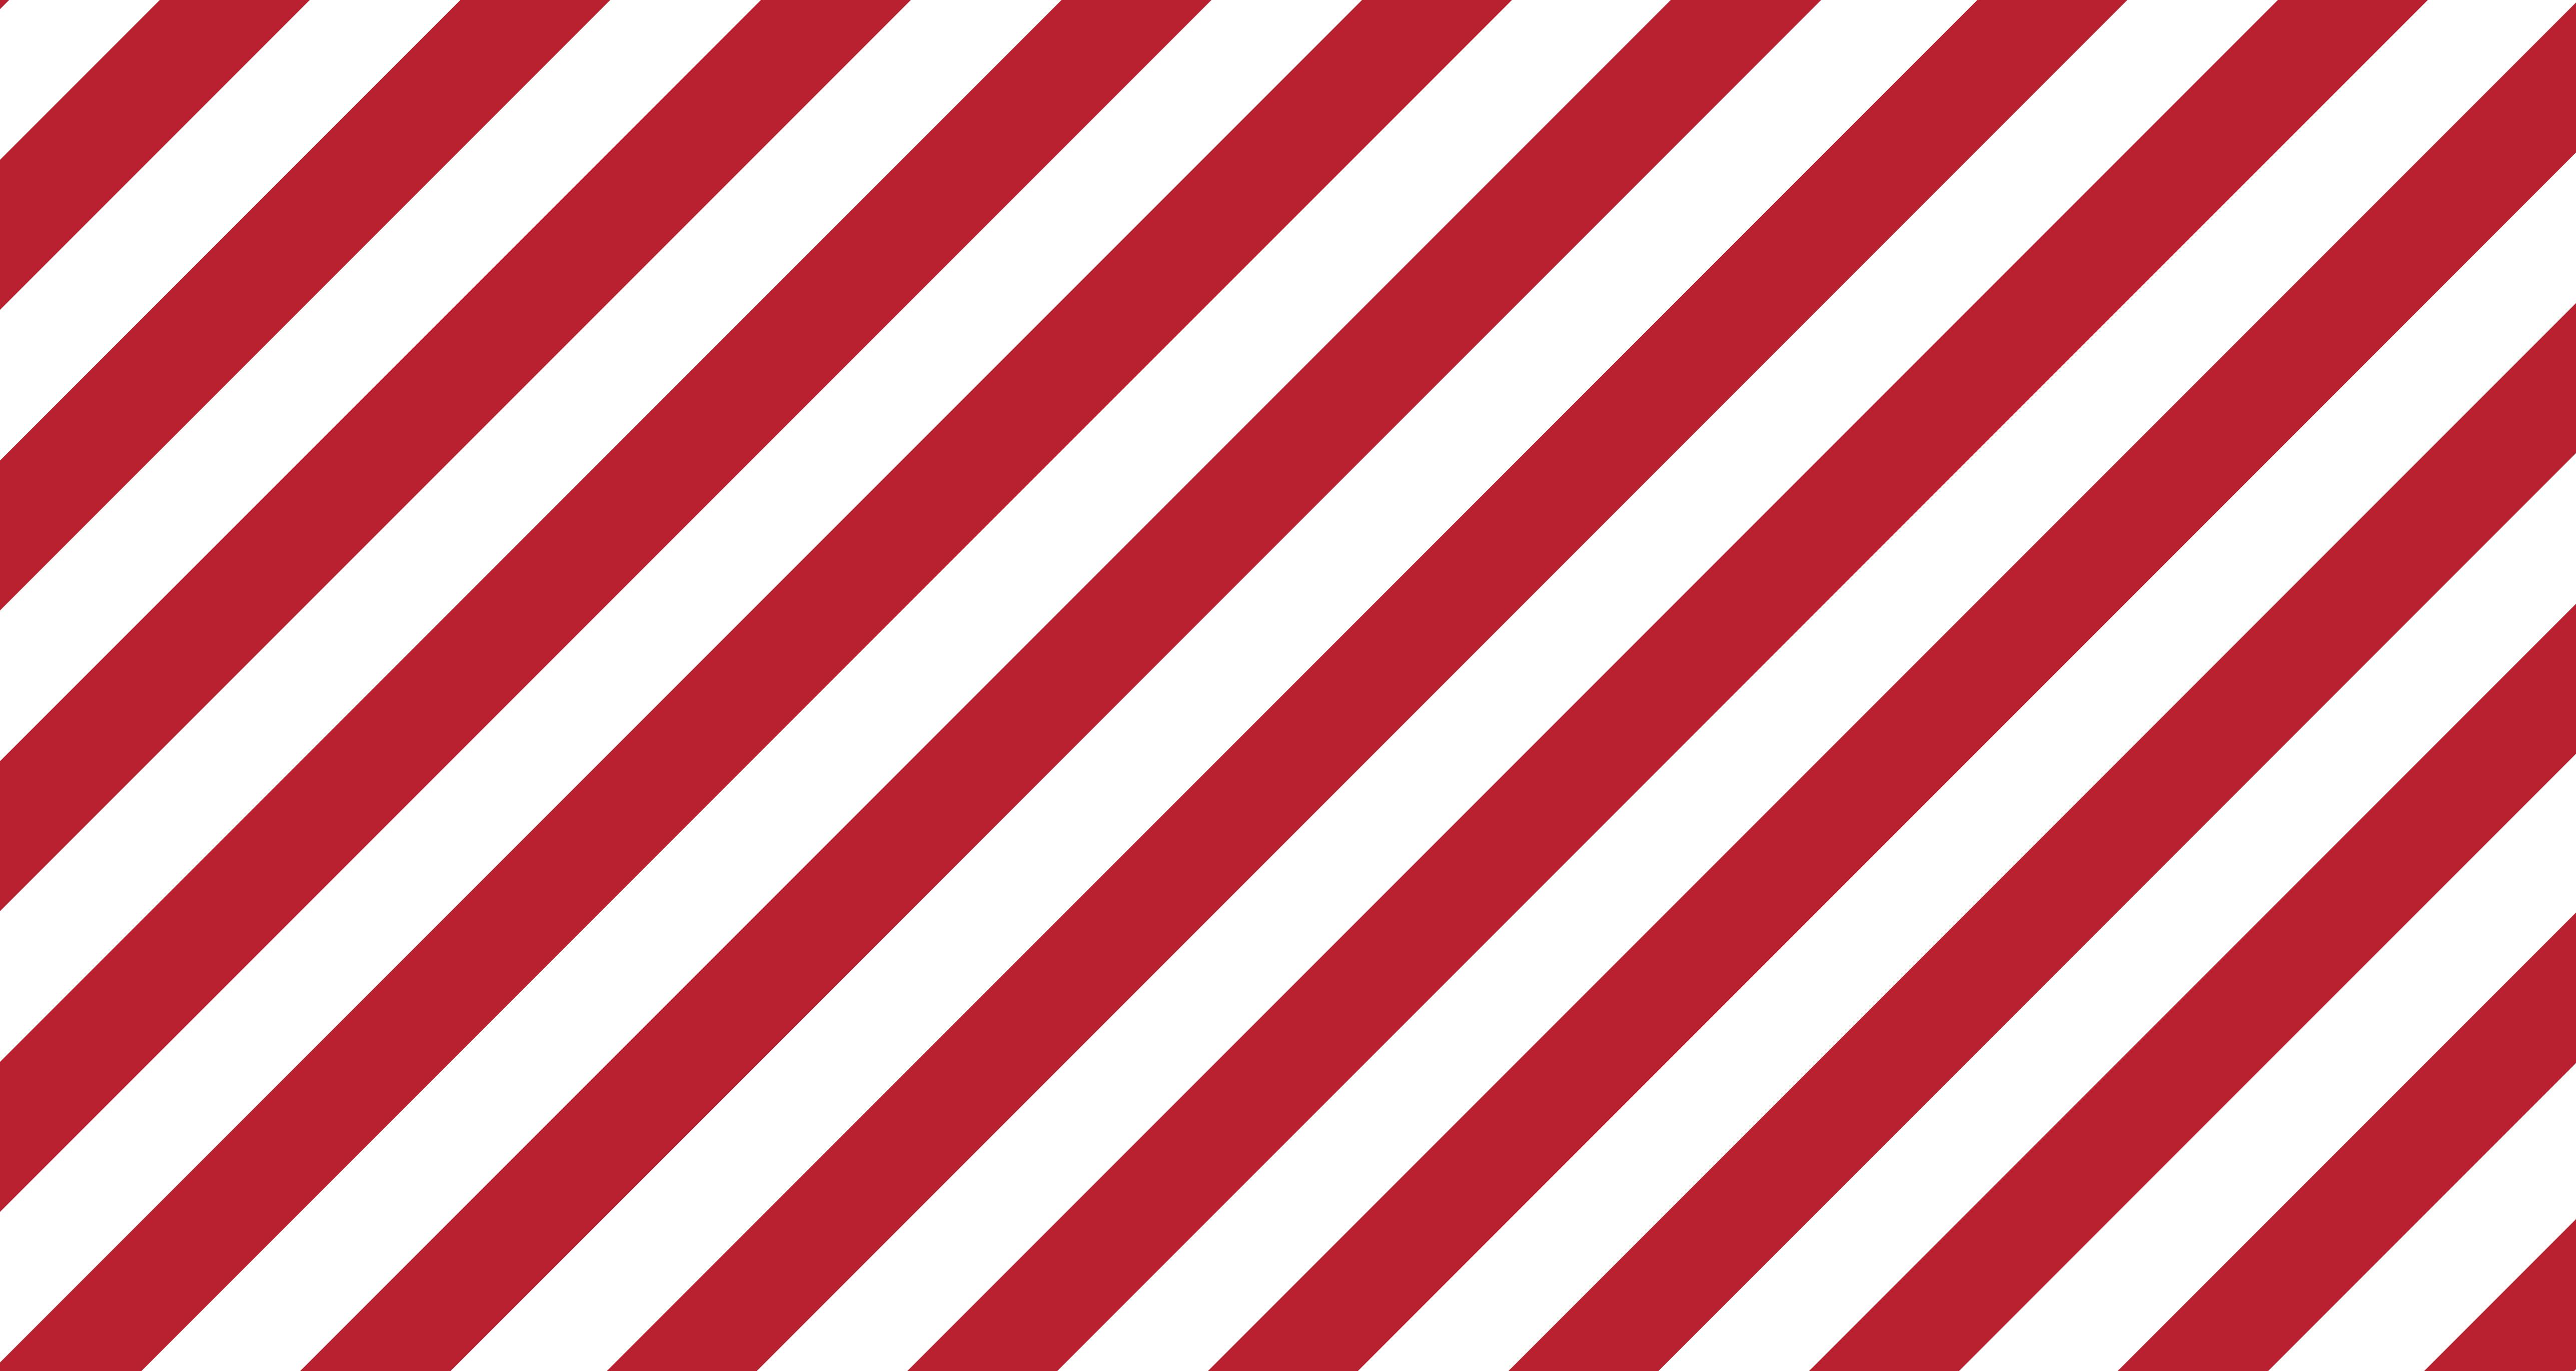 American_flag_7